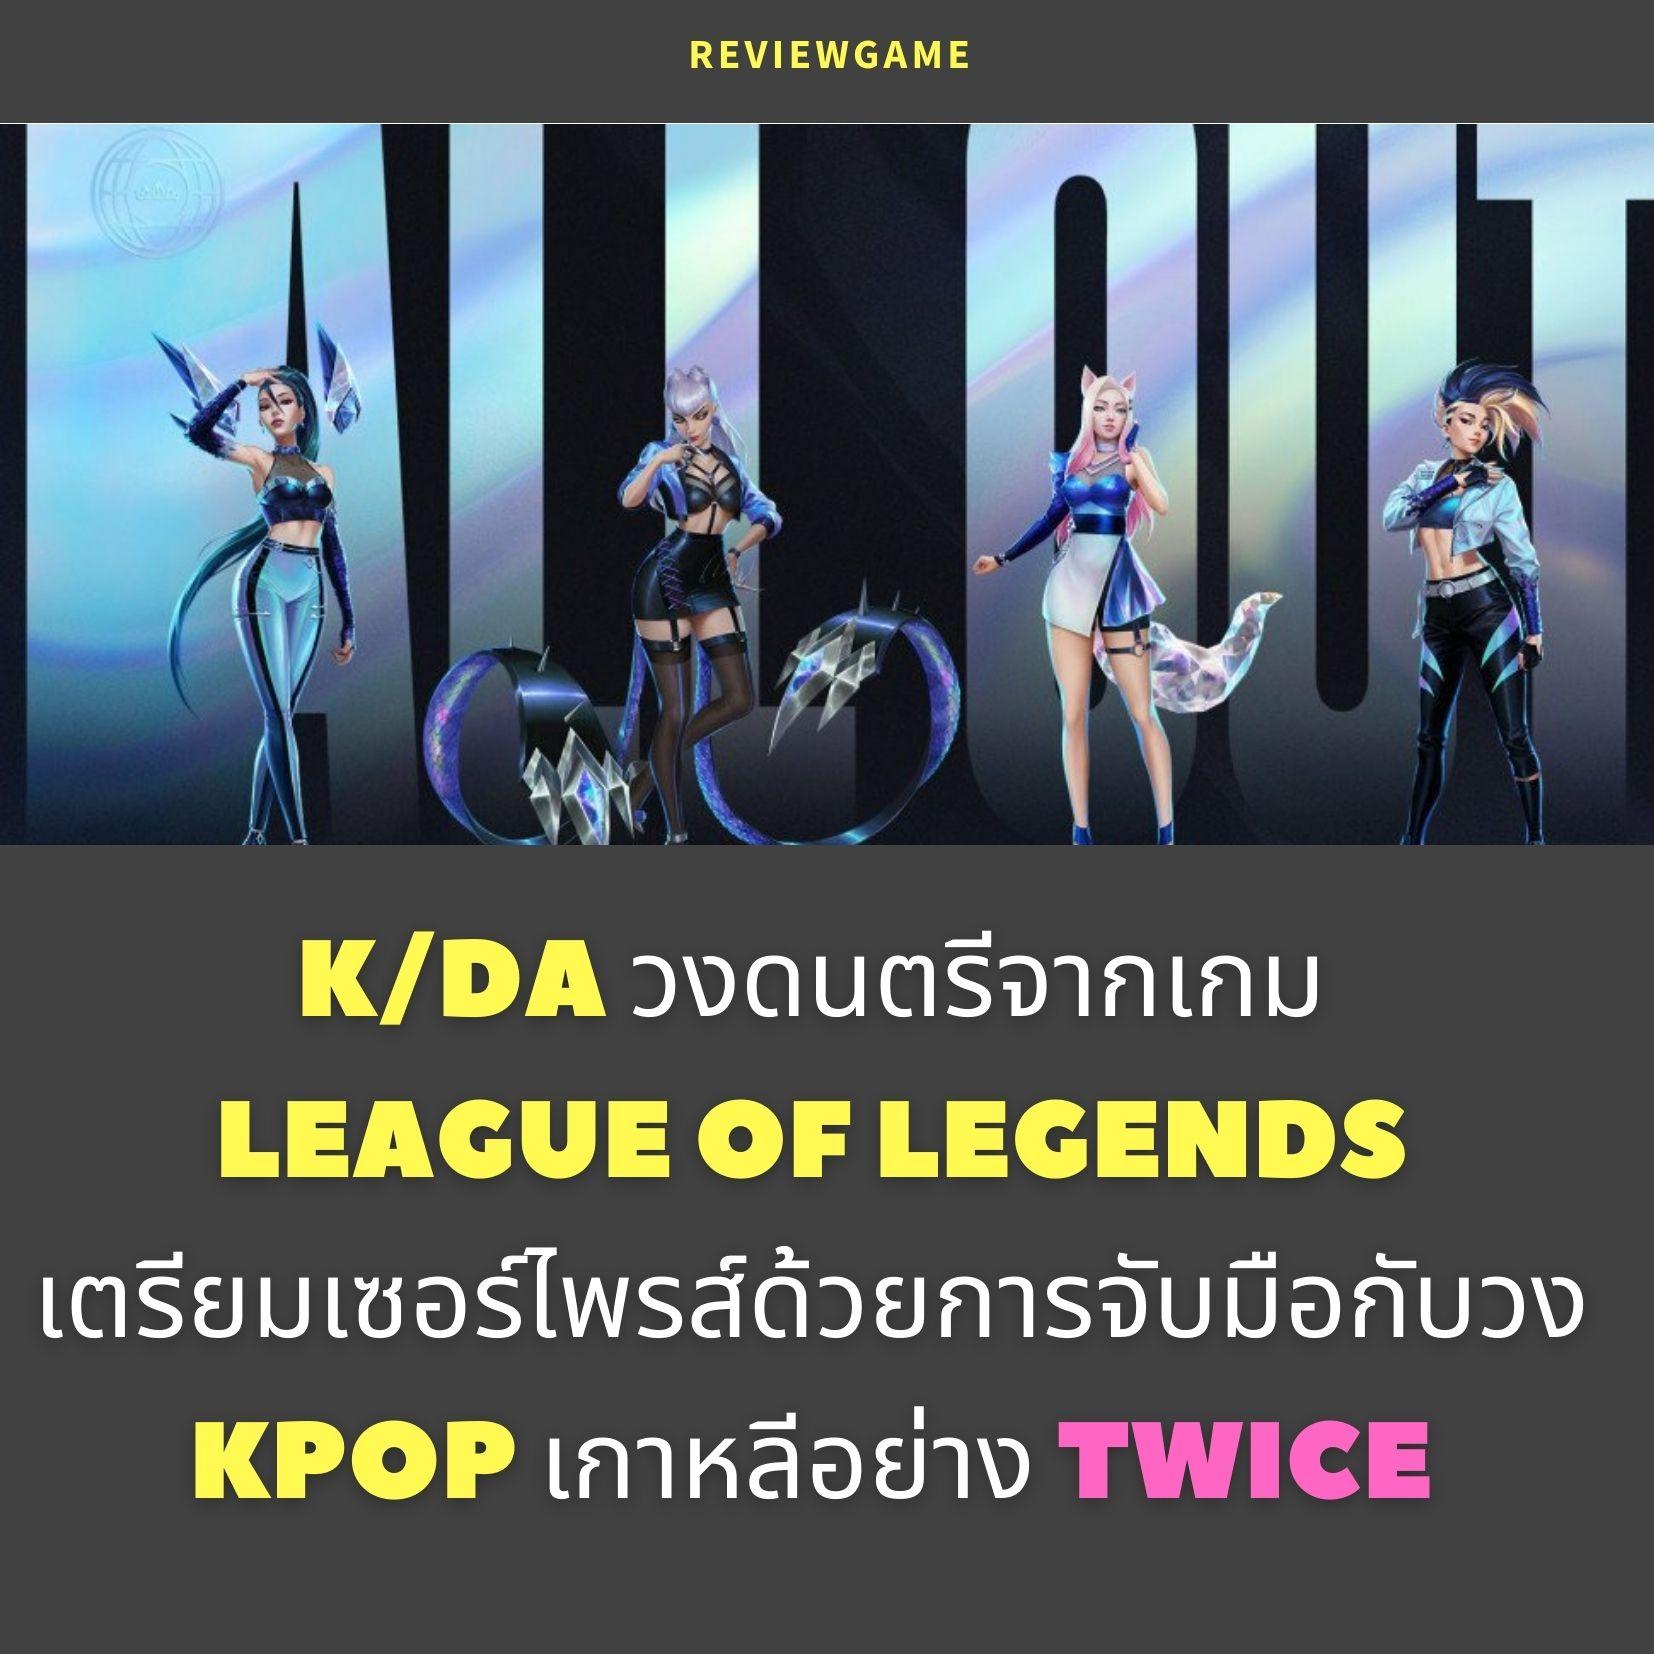 K/DA วงดนตรีจากเกม League of Legends เตรียมเซอร์ไพรส์ แฟนด้วยการจับมือกับวง Kpop เกาหลีอย่าง Twice ALL OUT EP ROSTER ชื่อเพลง